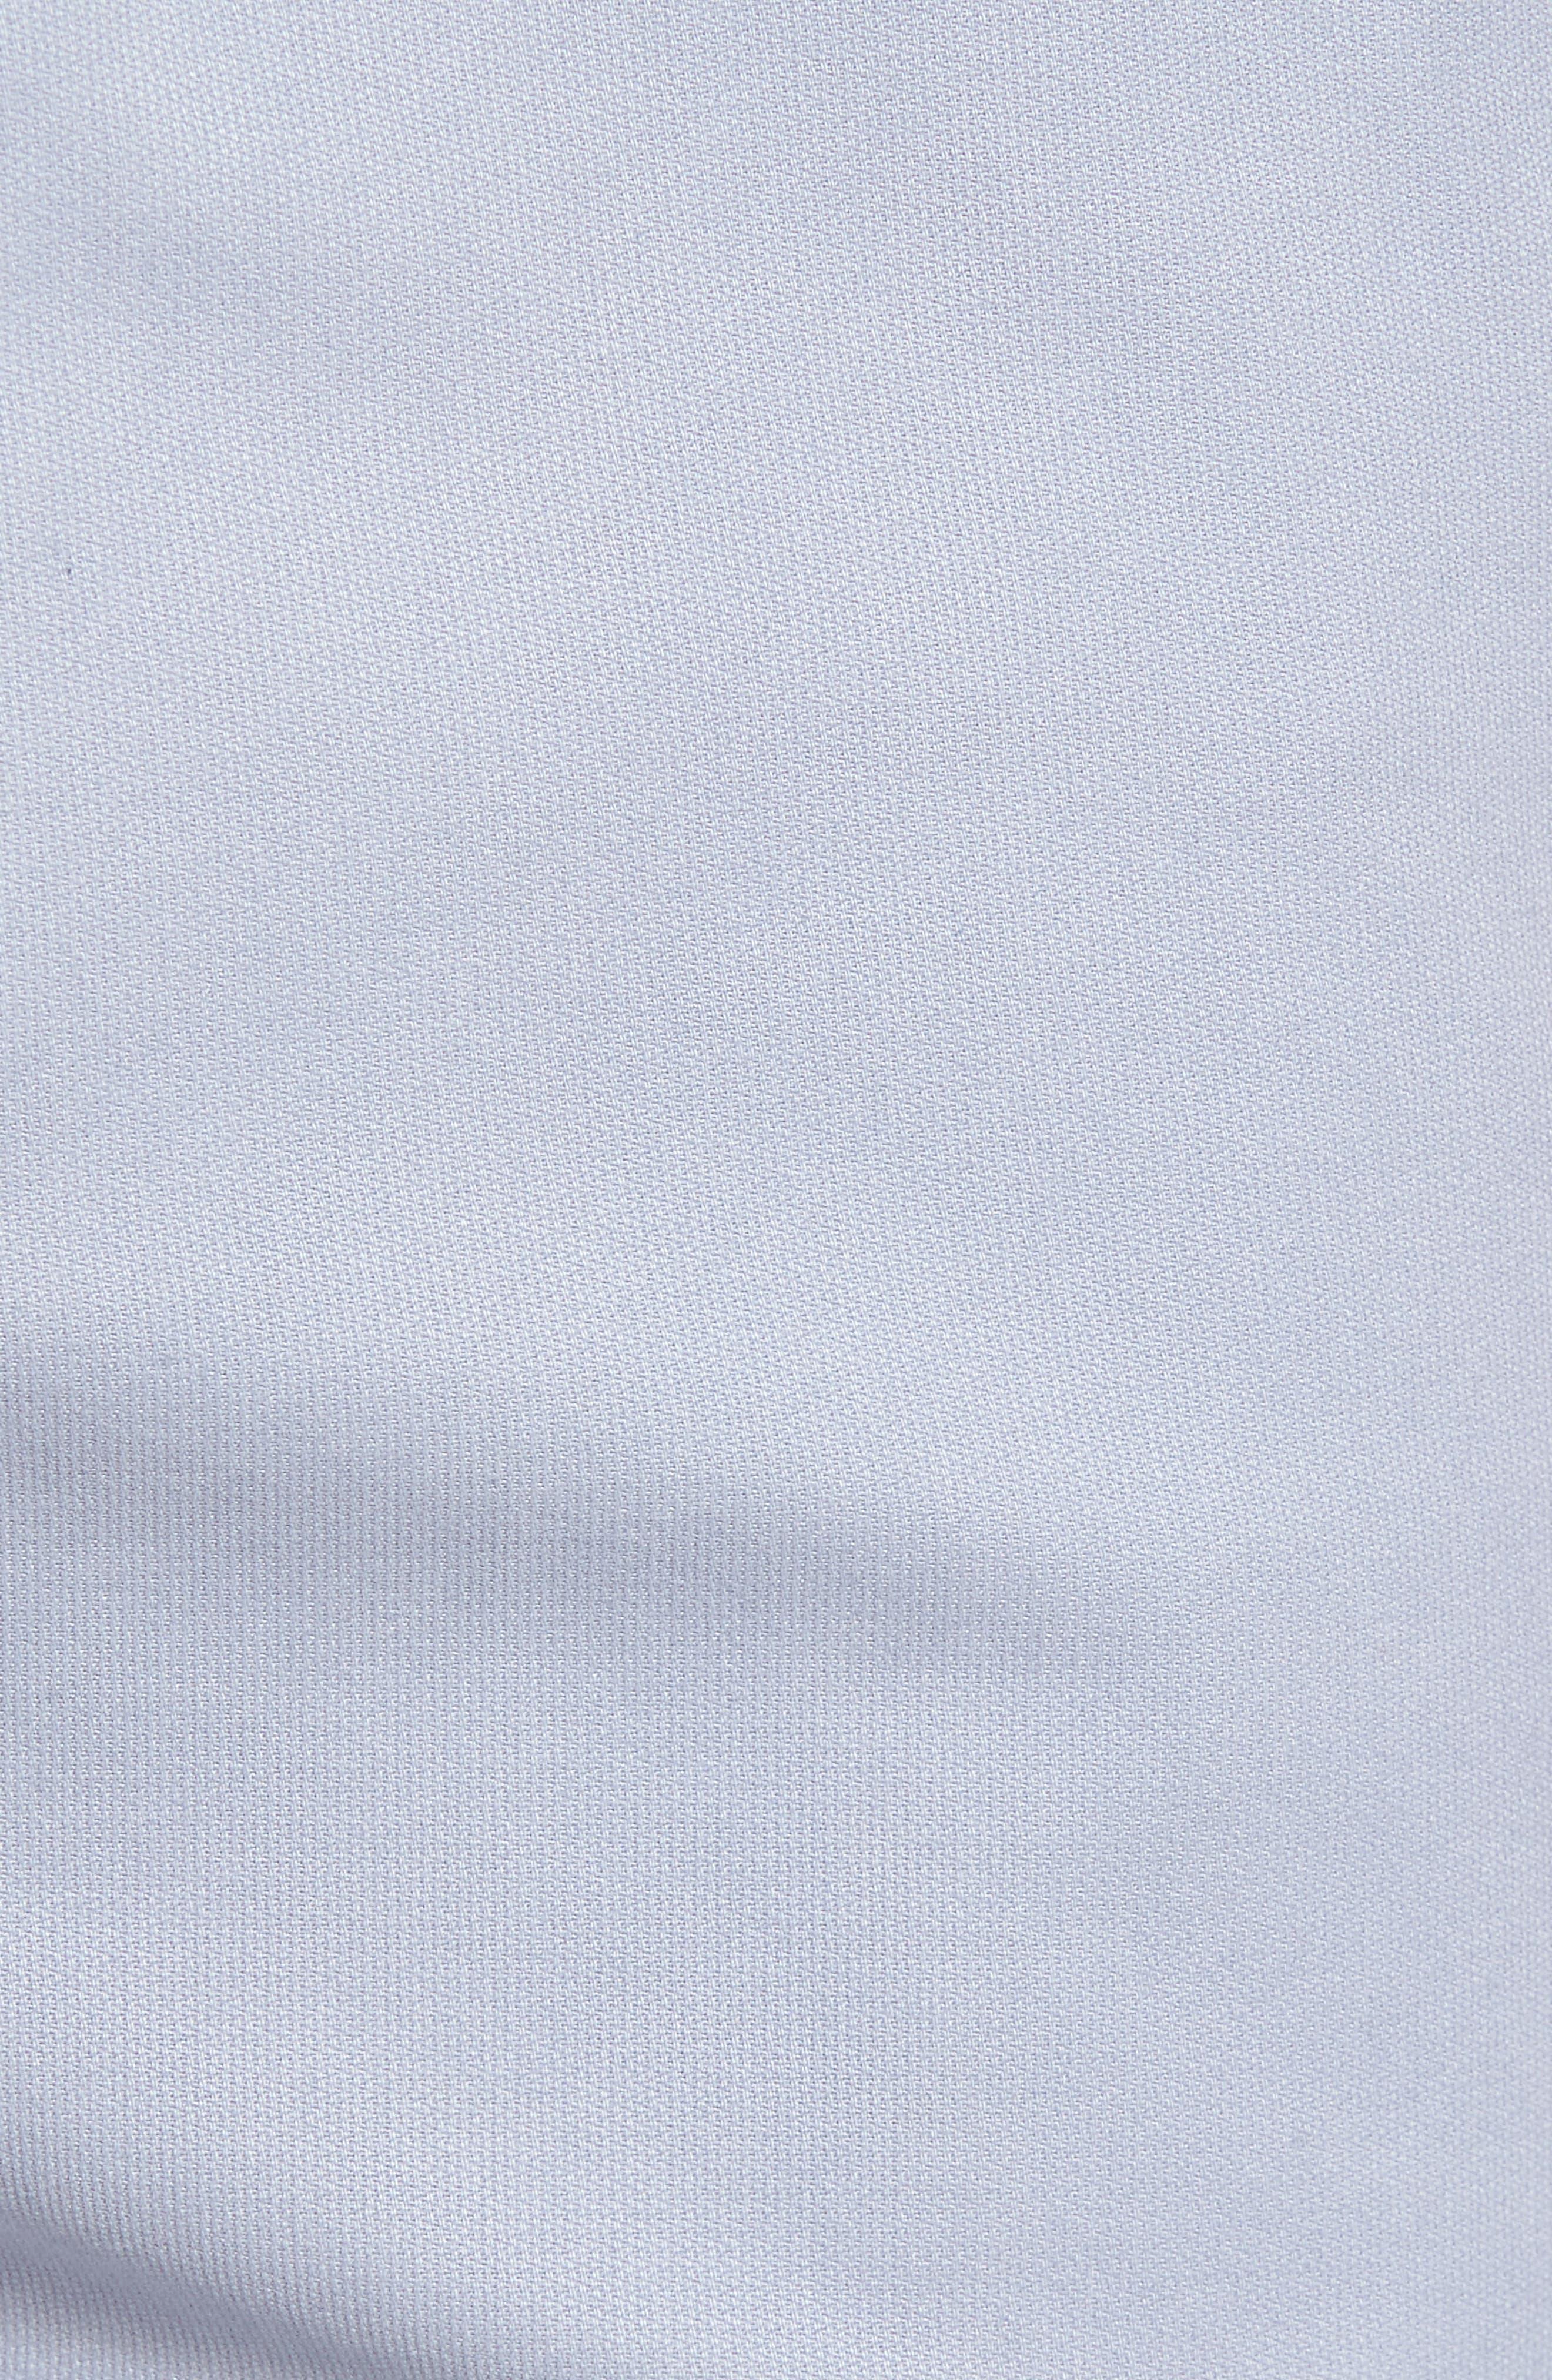 Drawstring Bedford Corduroy Shorts,                             Alternate thumbnail 15, color,